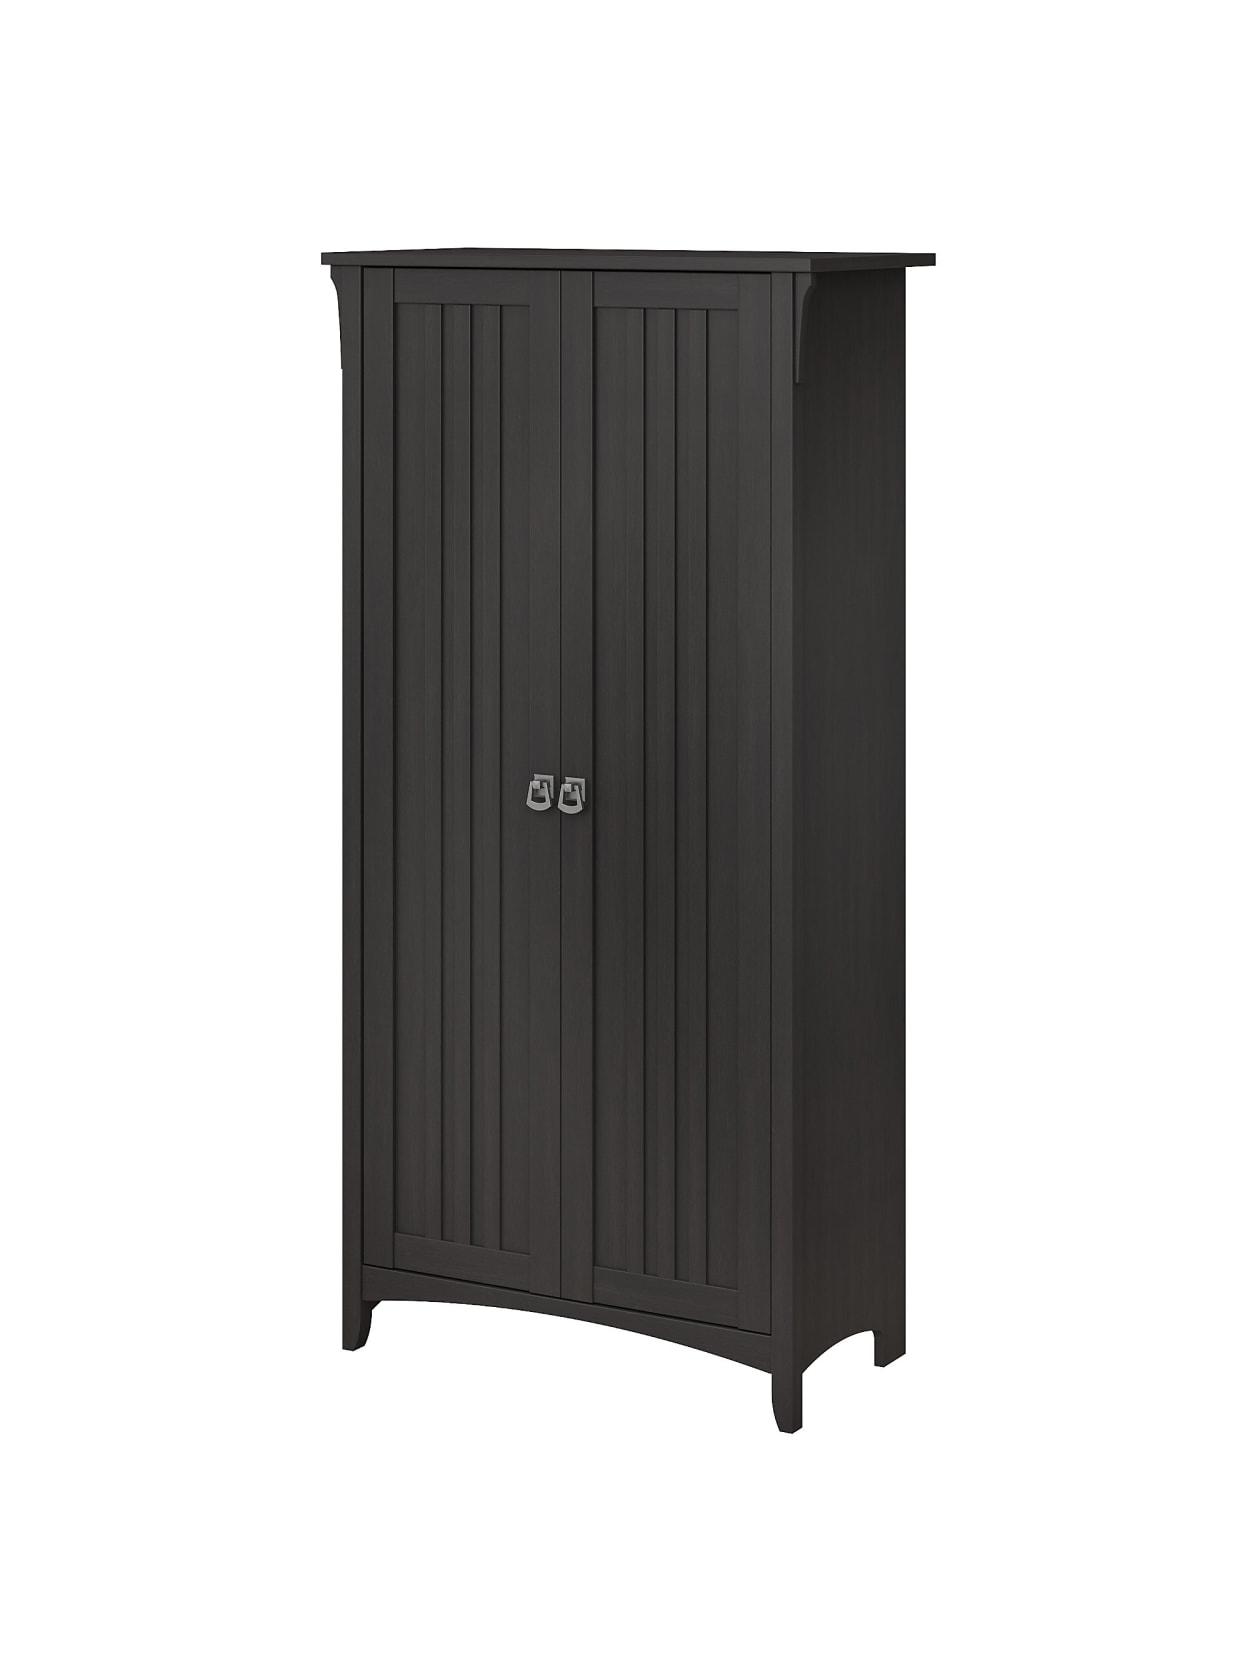 Bush Furniture Salinas 63 H Kitchen Pantry Cabinet With Doors Vintage Black Standard Delivery Office Depot